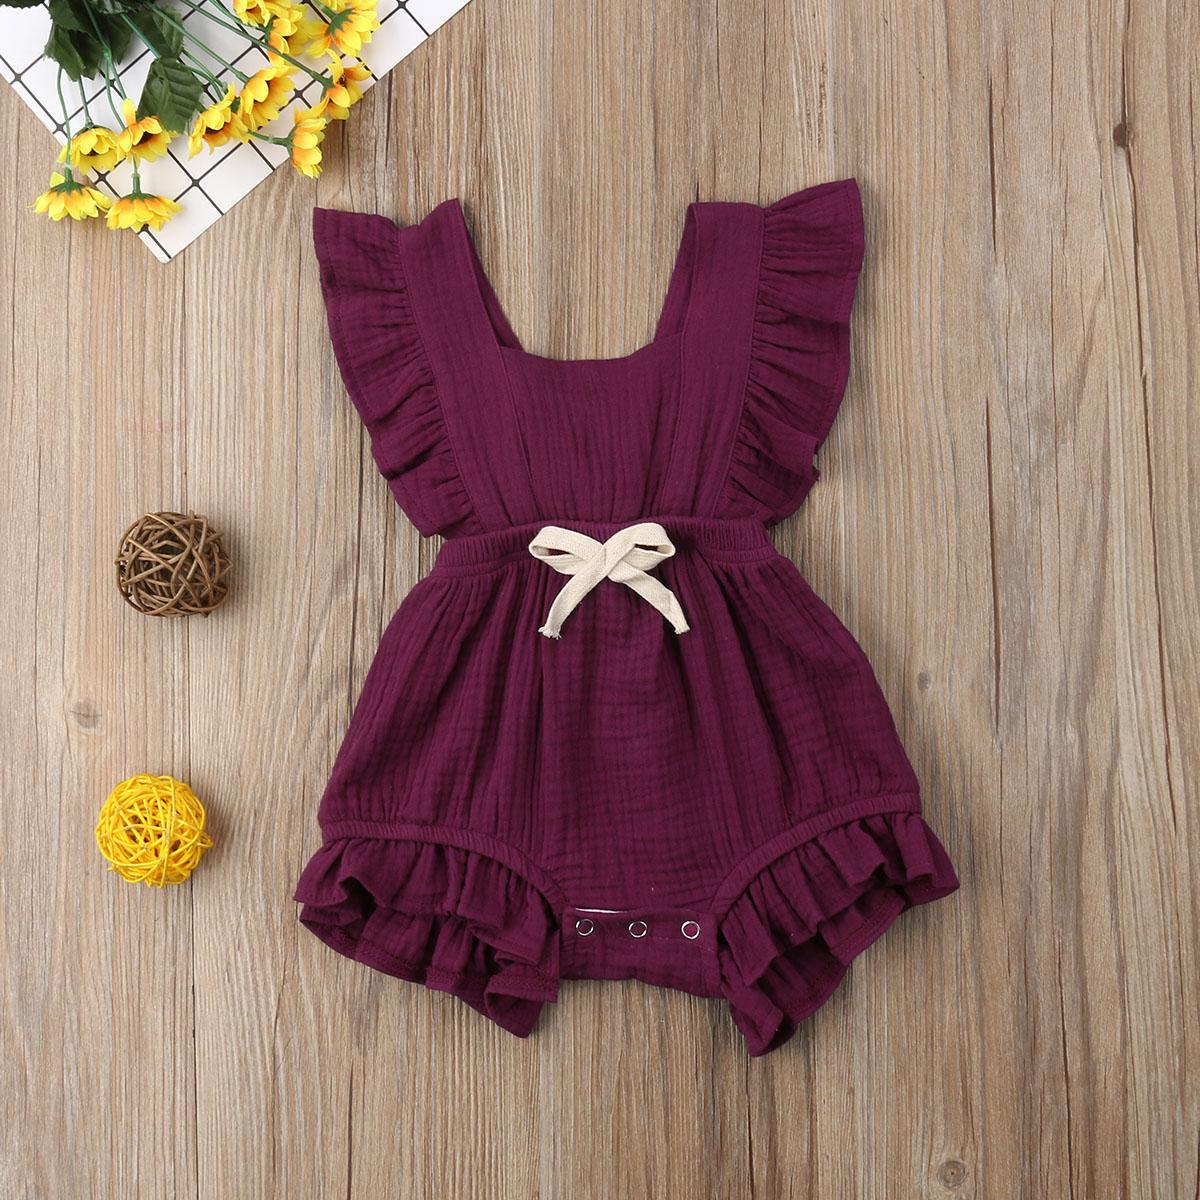 HTB11bjfao rK1Rjy0Fcq6zEvVXaj New Arrivels Baby Girls Ruffle One-Pieces Clothes Summer Newborn Kids Sleeveless Romper Jumpsuit Outfits Sunsuit